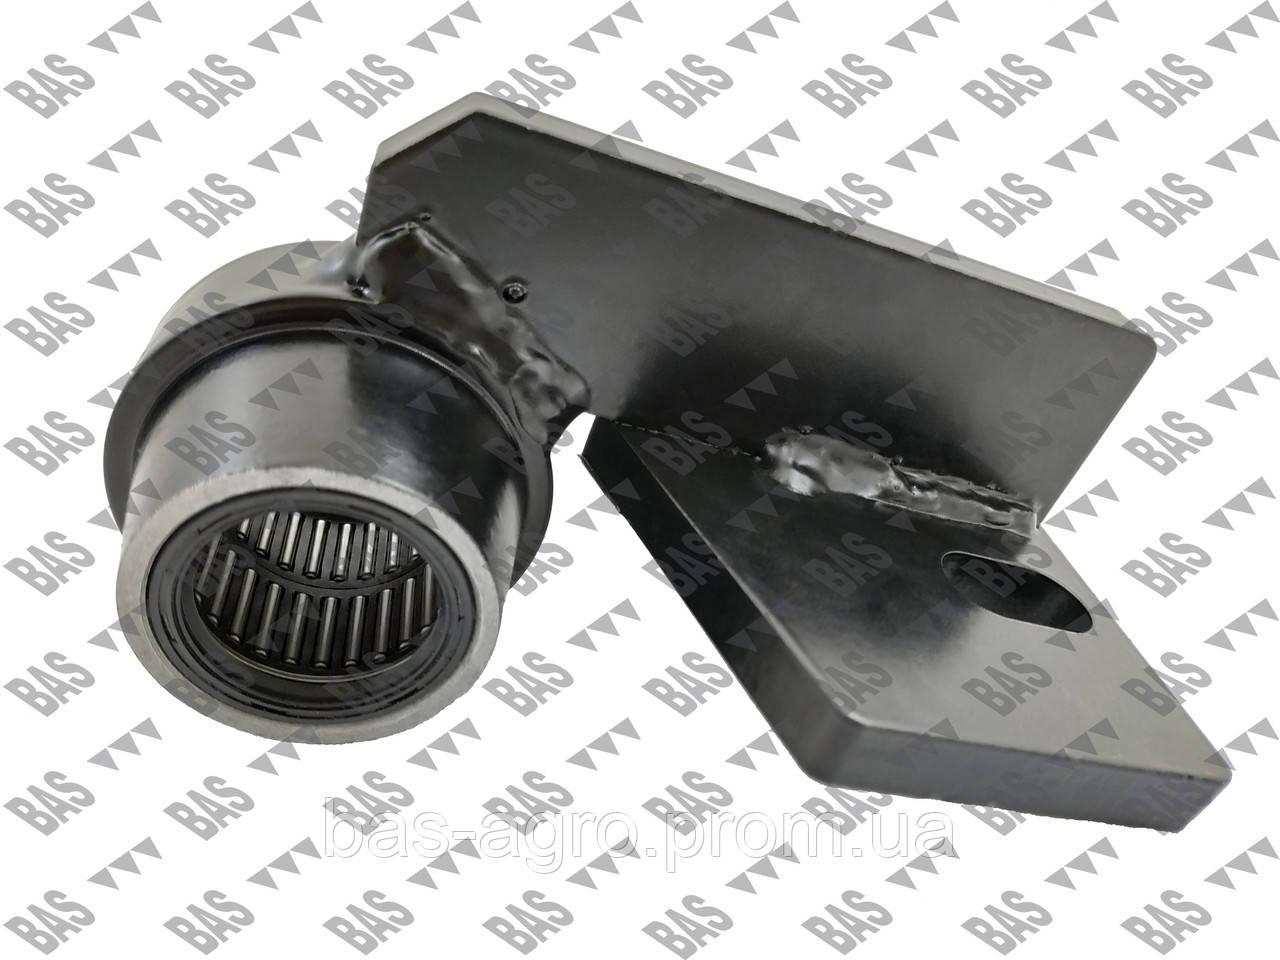 Суппорт вальца правый в сборе Fantini 12125 аналог